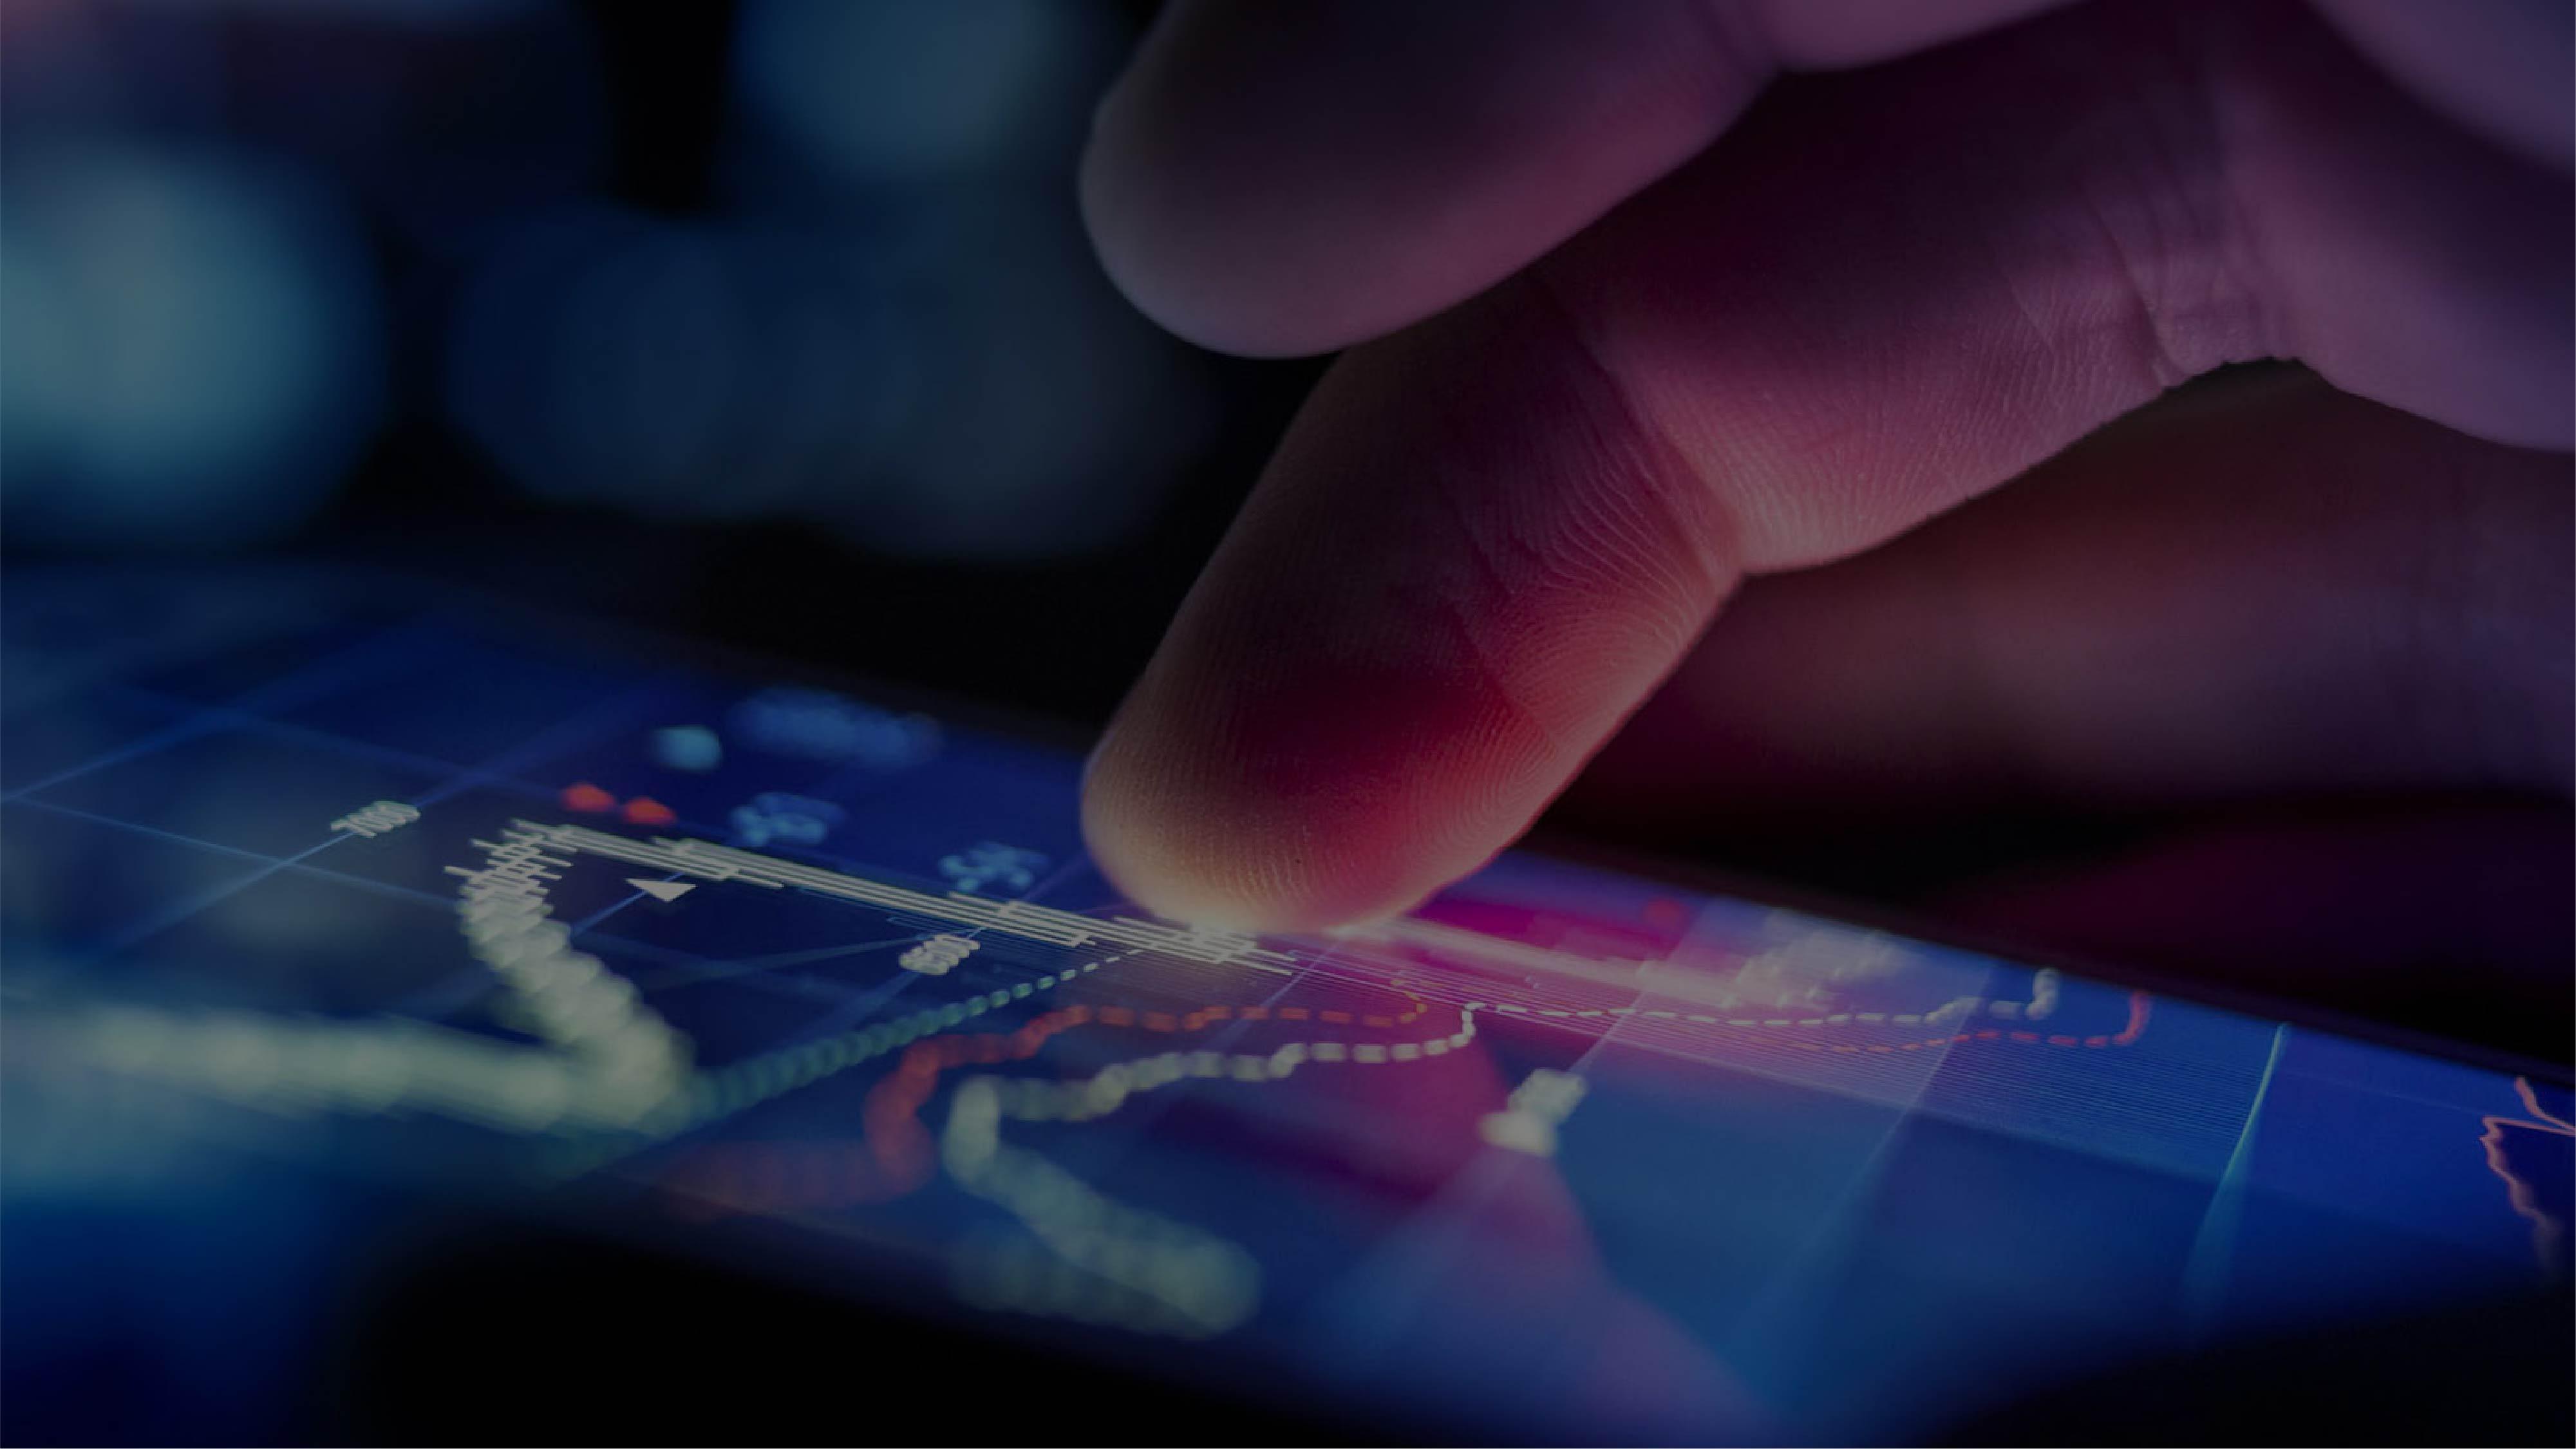 Cerca Technology Top 10 Infor Supplier 2019